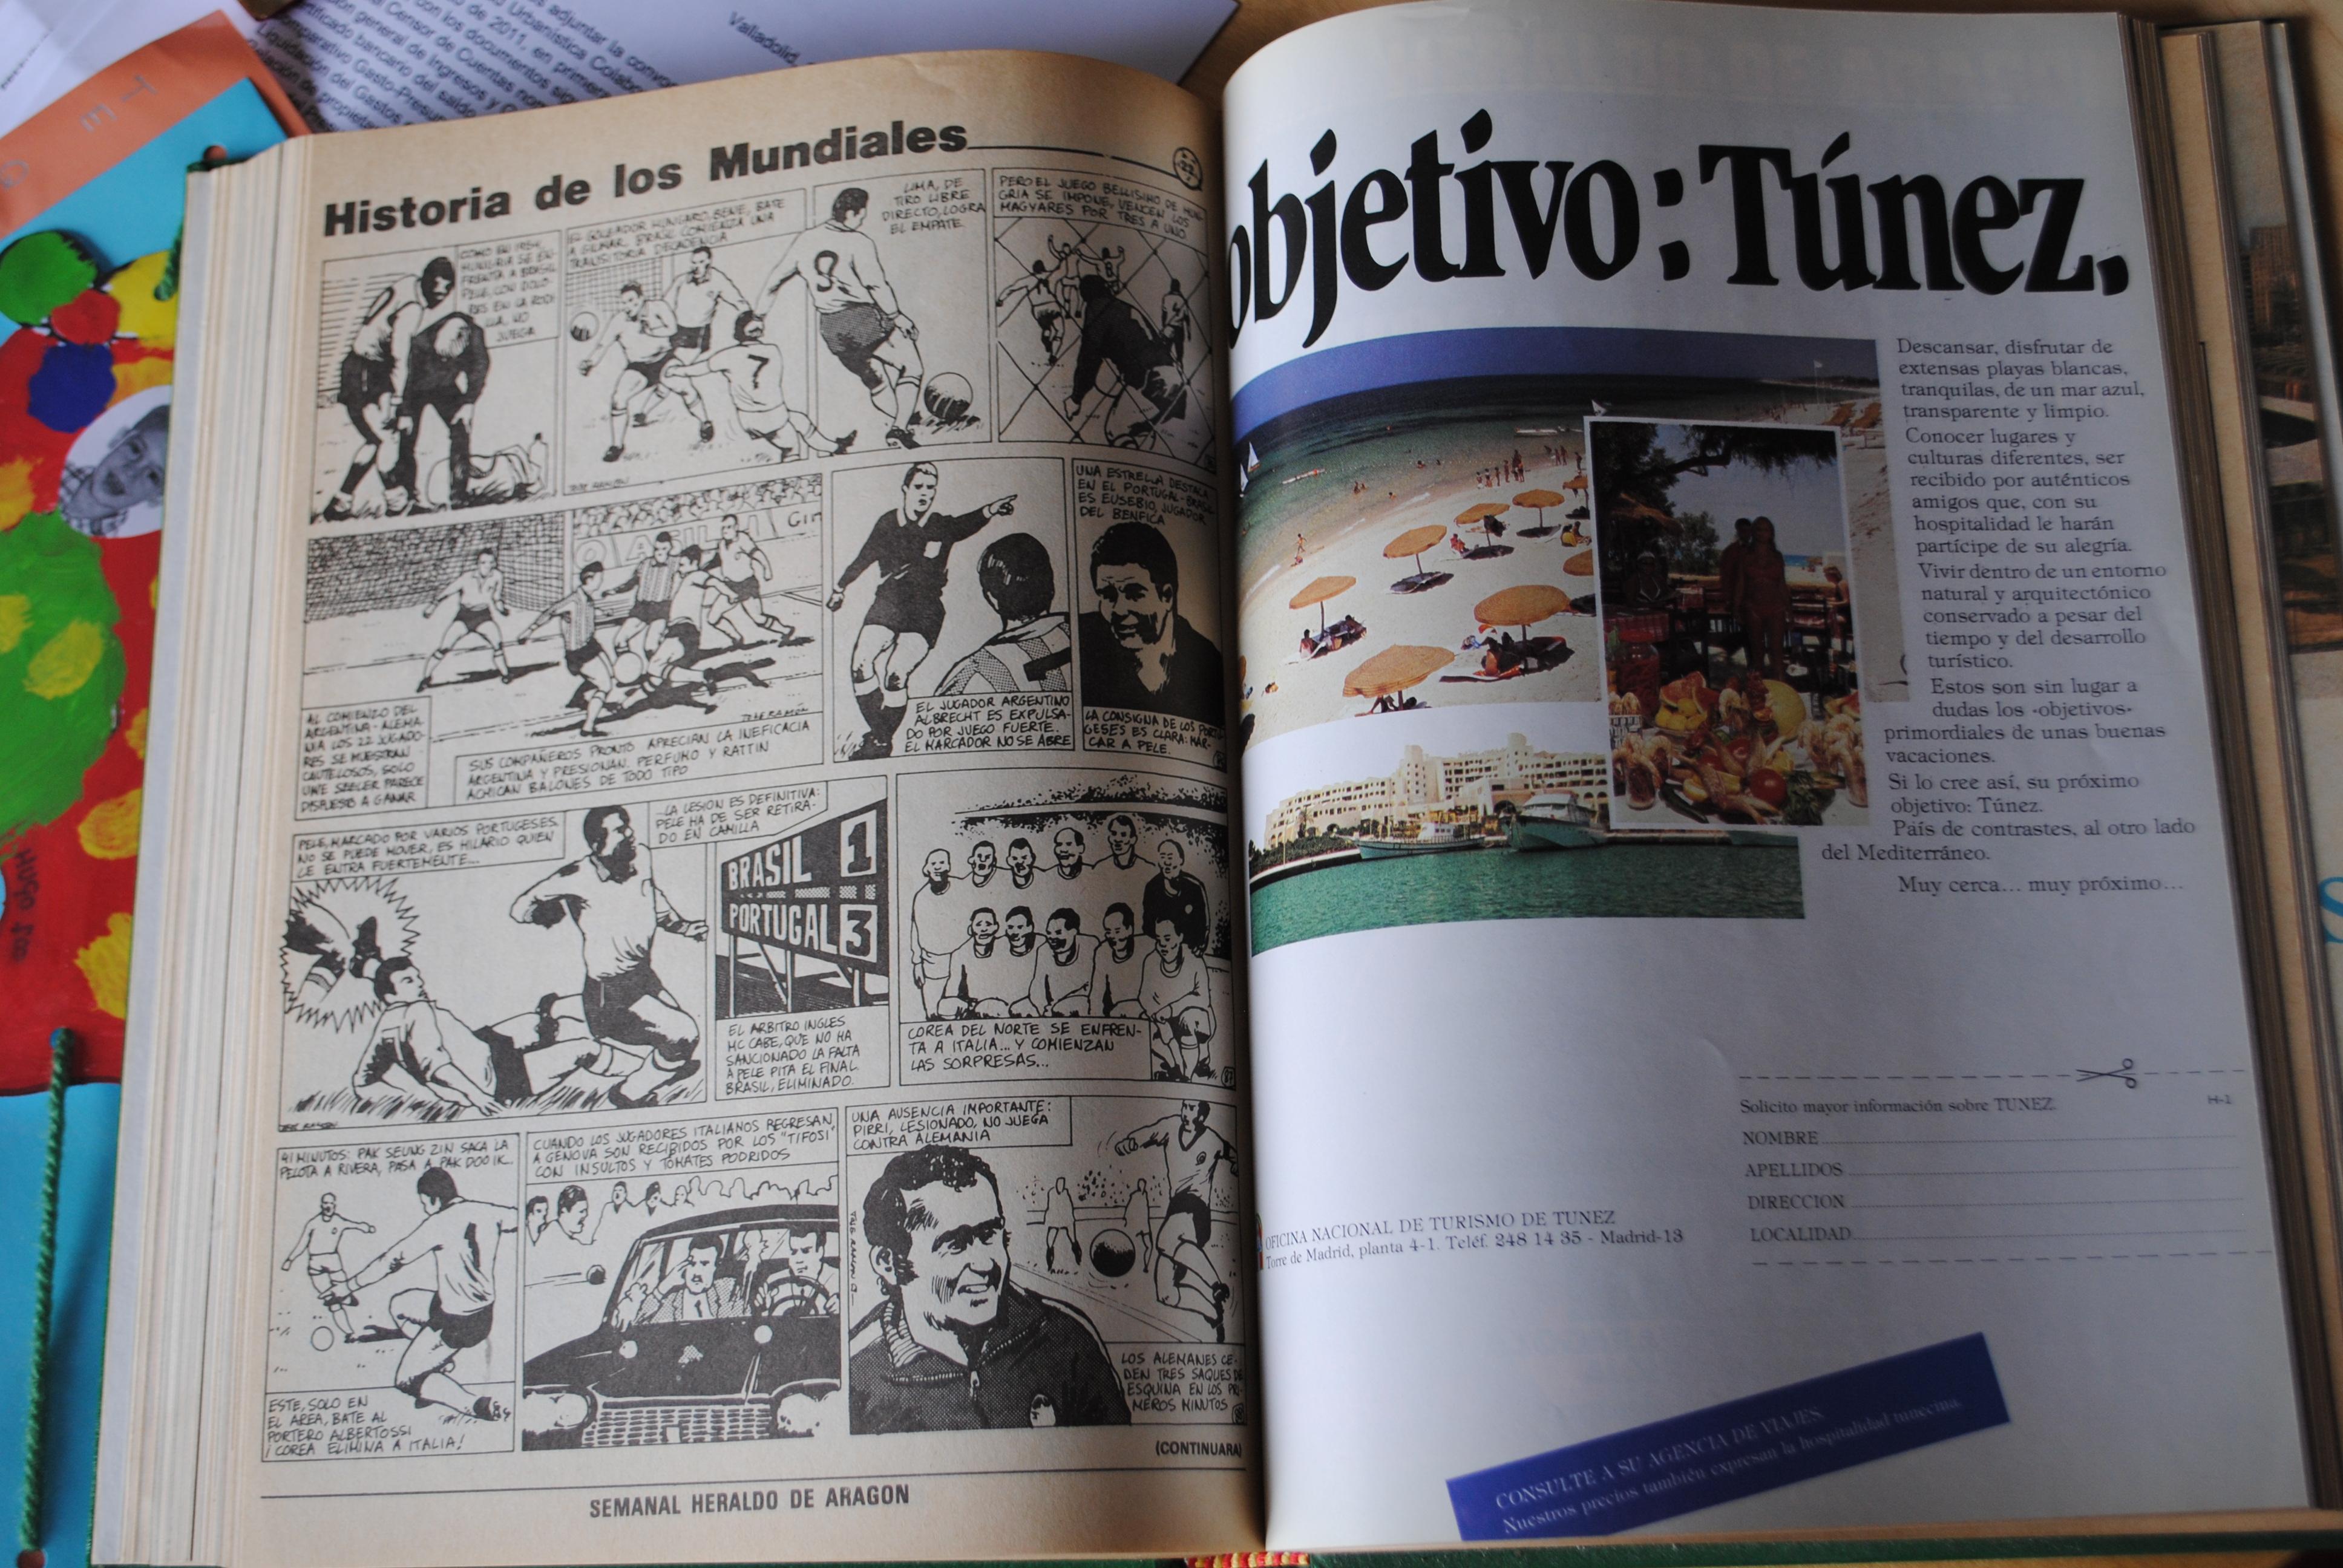 Coleccionismo deportivo: CAMPEONATO MUNDIAL DE FUTBOL 1982. HERALDO DE ARAGON. COMPLETO!!!!!!!!!! MUNDIAL 82 - Foto 5 - 27249749